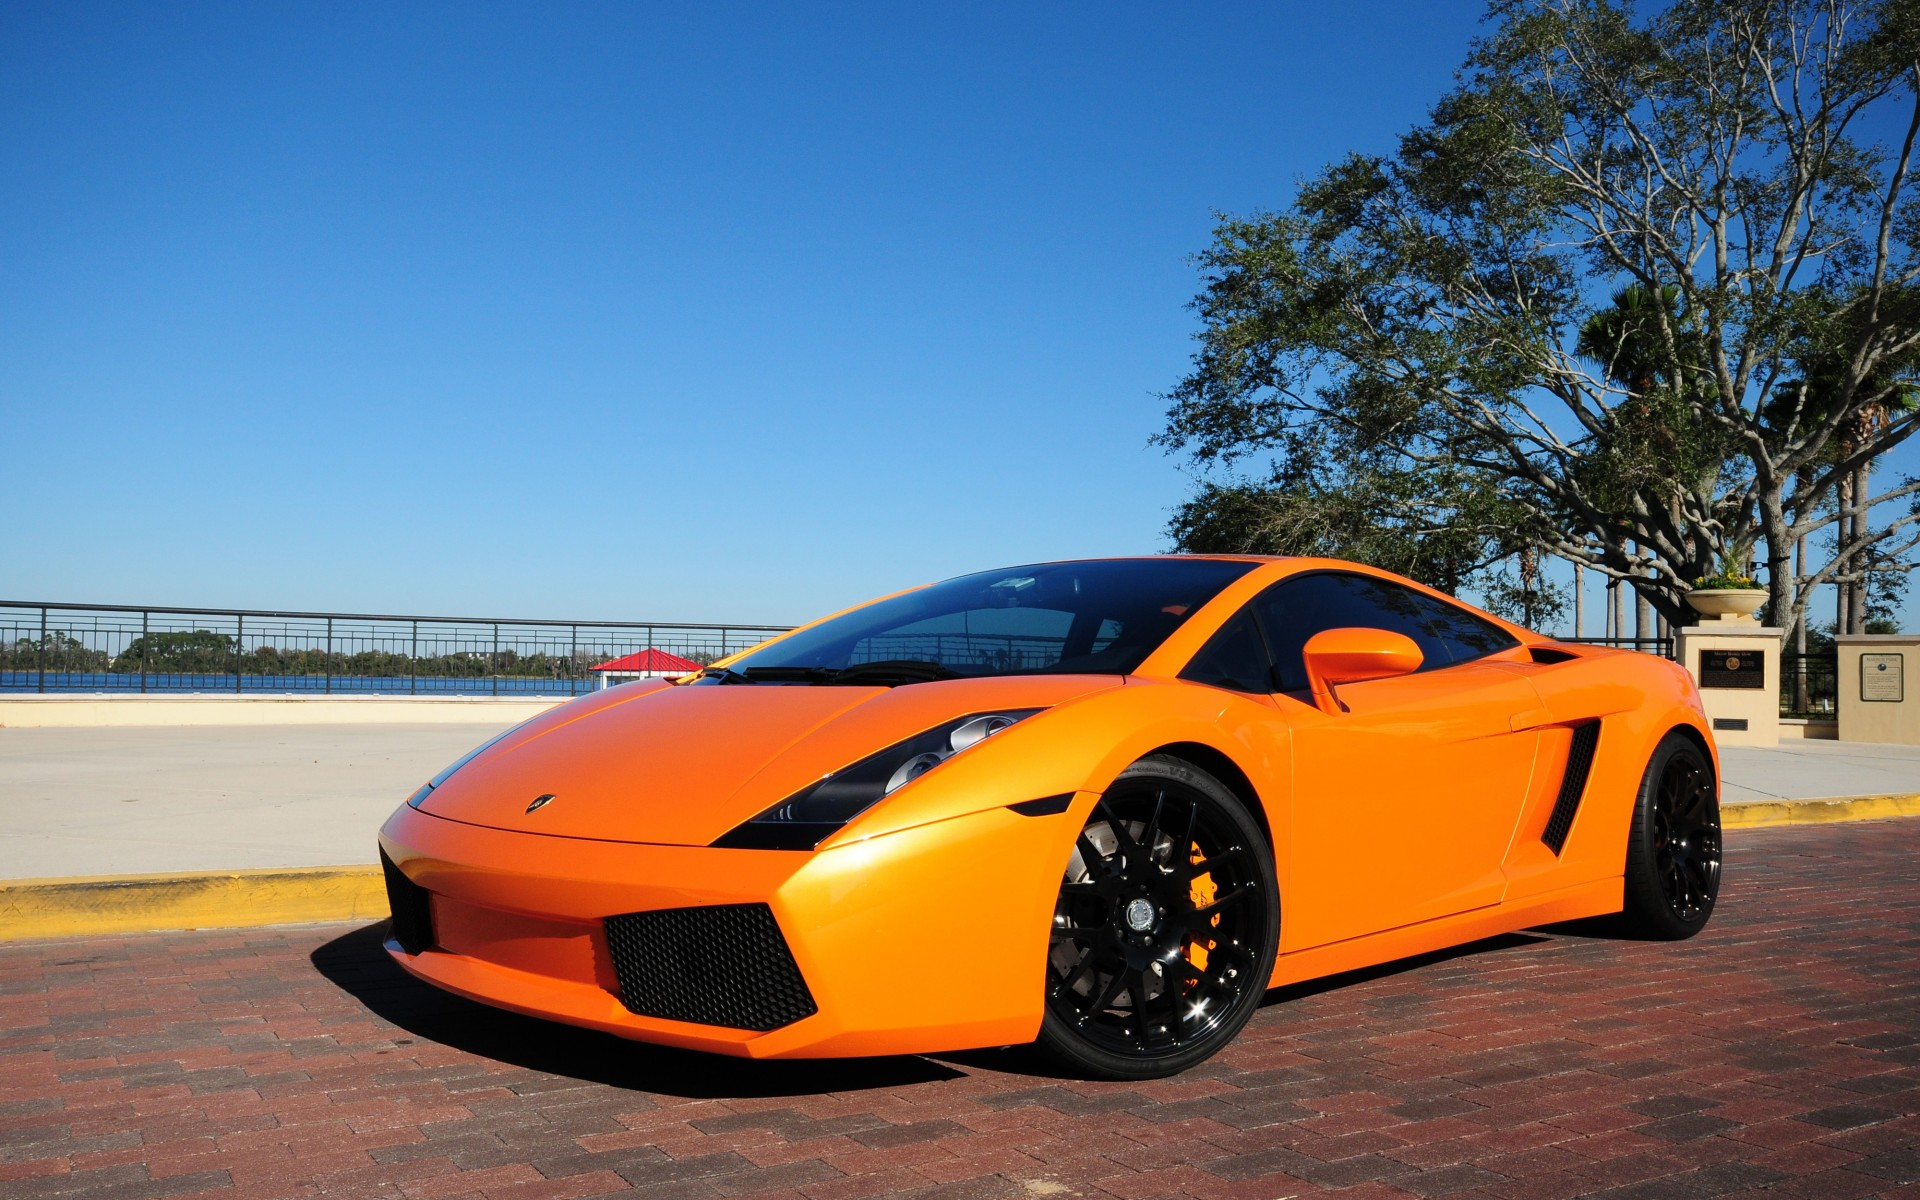 Lamborghini Gallardo Orange Wallpaper | HD Car Wallpapers ...